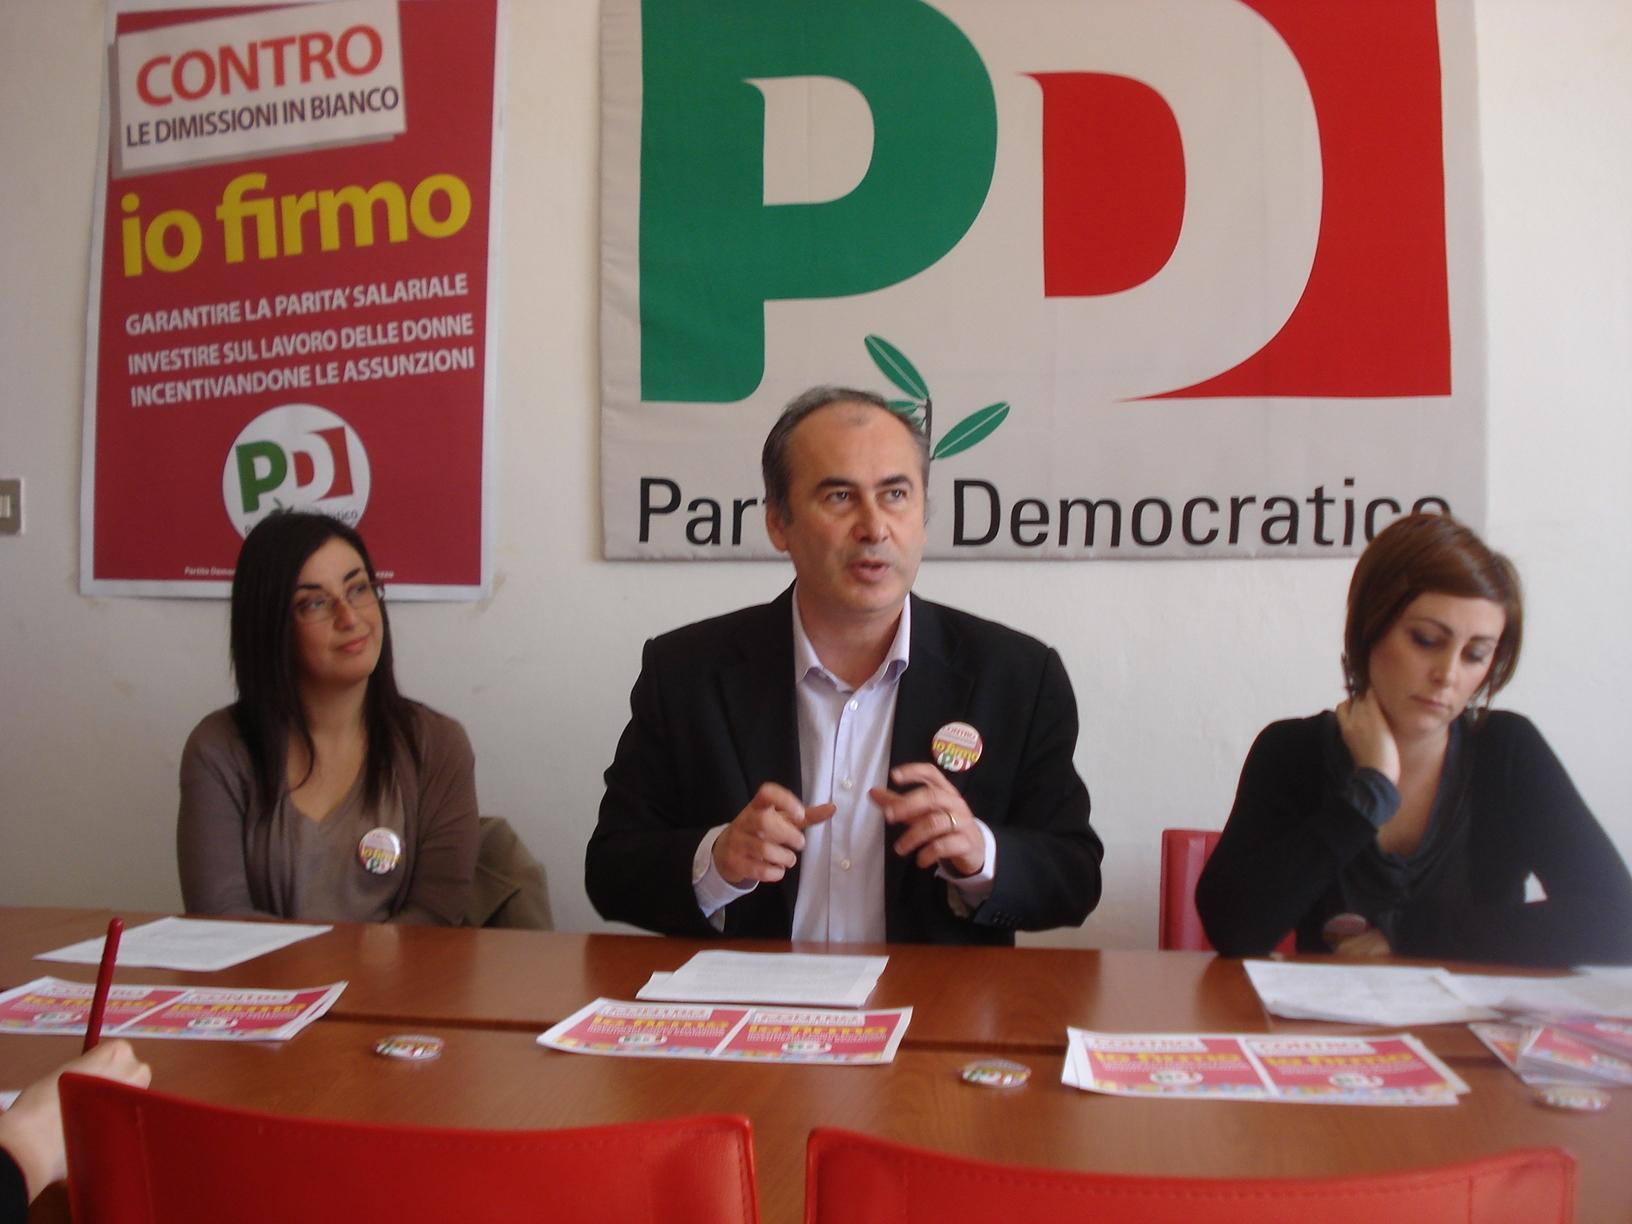 Marco Meacci (PD):